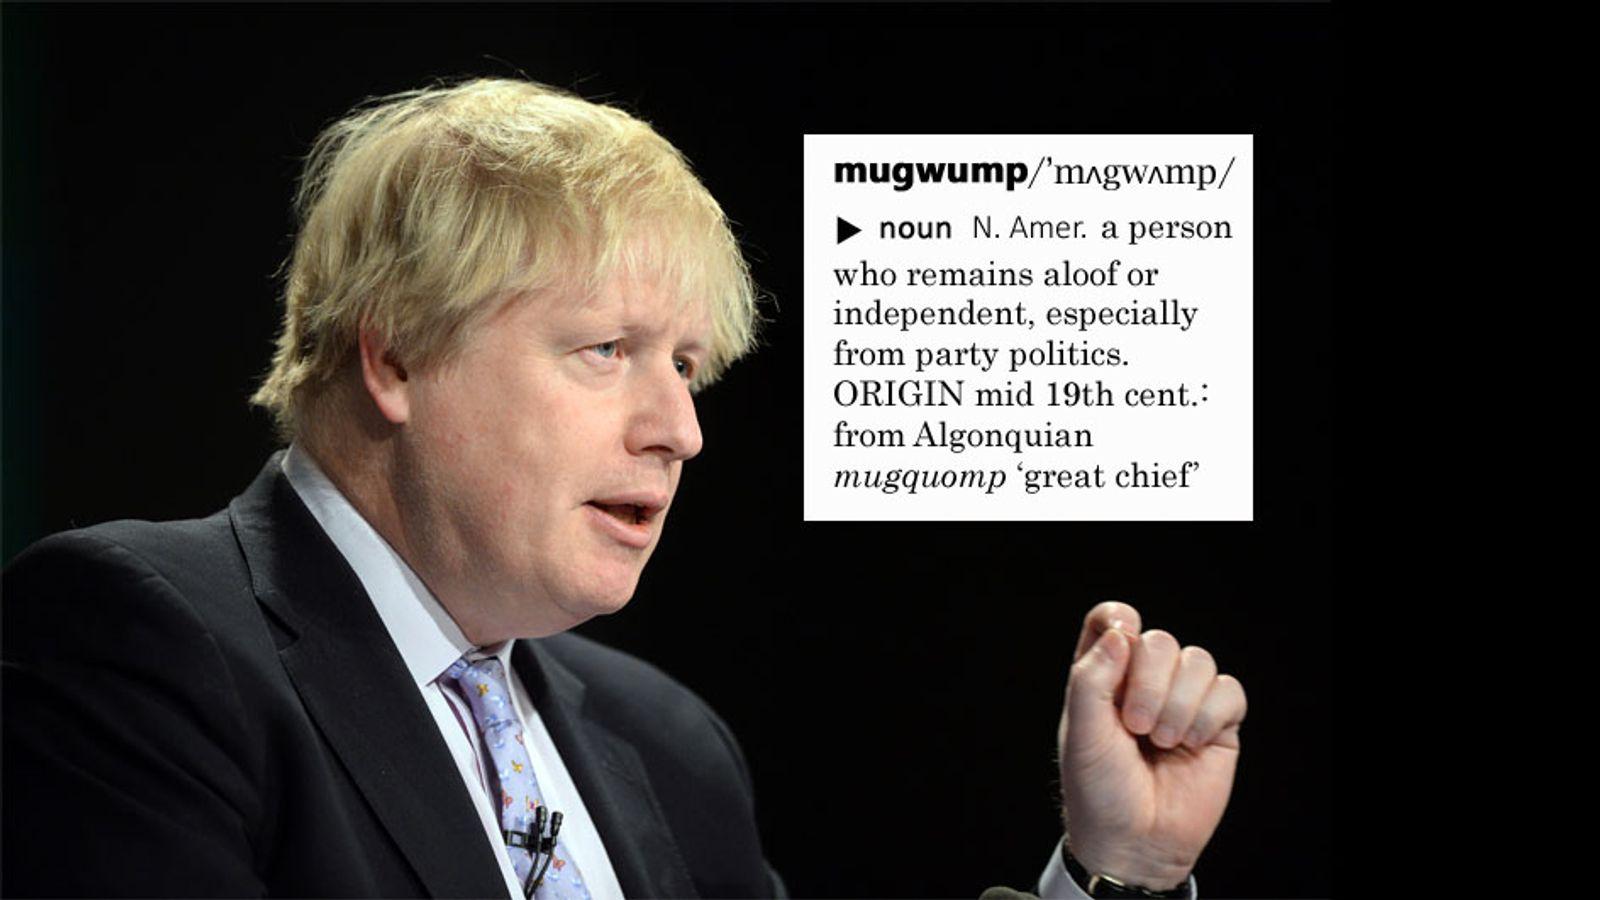 Boris Johnson described Jeremy Corbyn as a mugwump